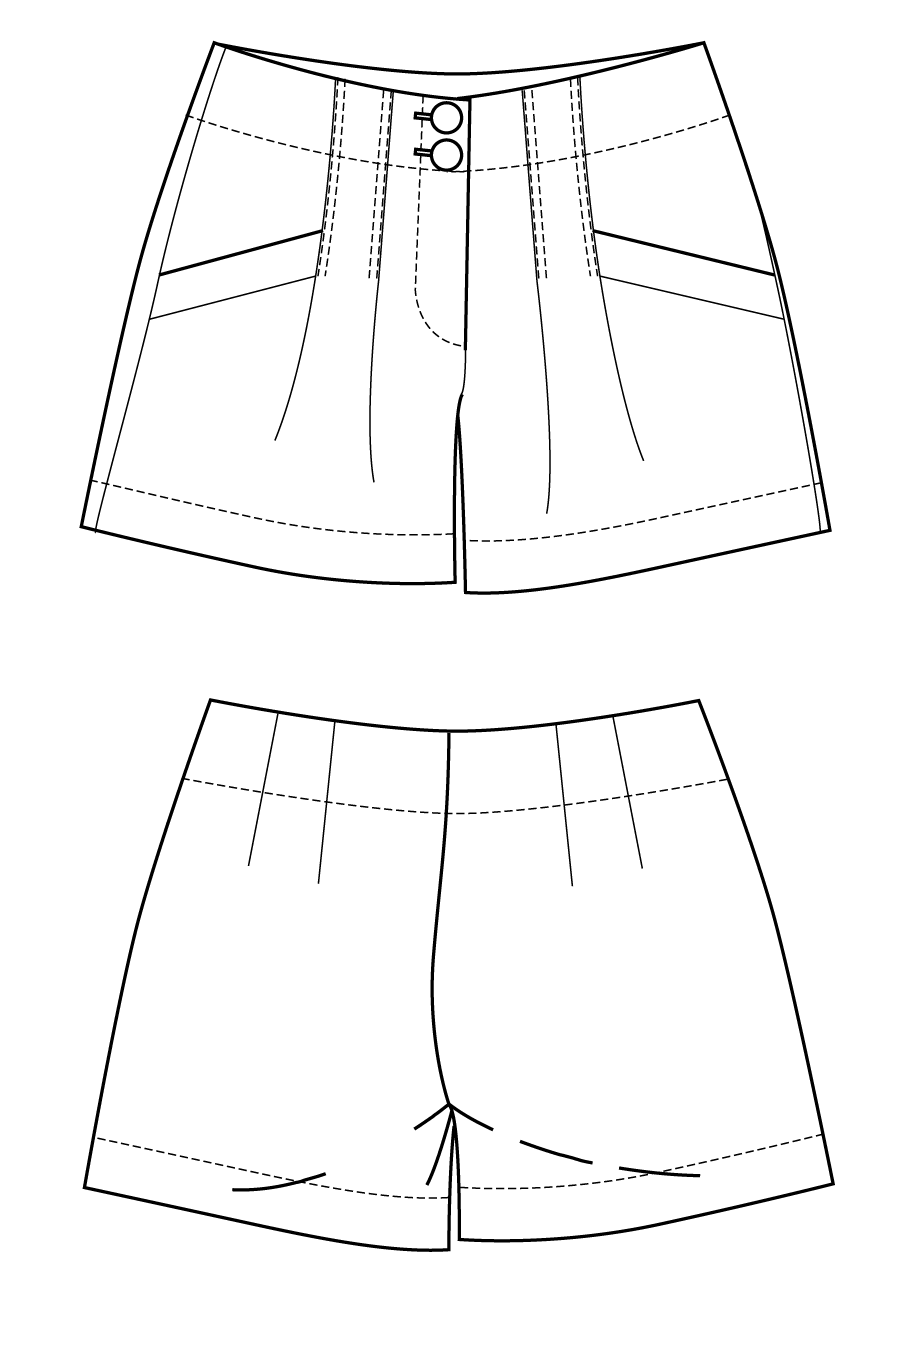 Panthea shorts flat drawing by Ralph Pink | Sewing patterns ...